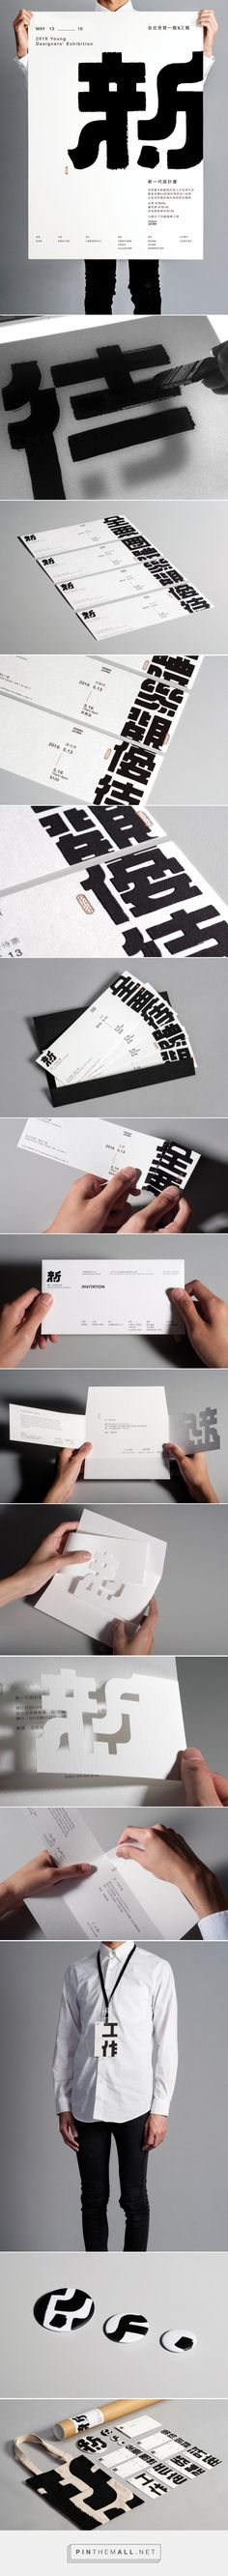 新一代設計展 2016 設計提案 | MyDesy 淘靈感... - a grouped images picture - Pin Them All